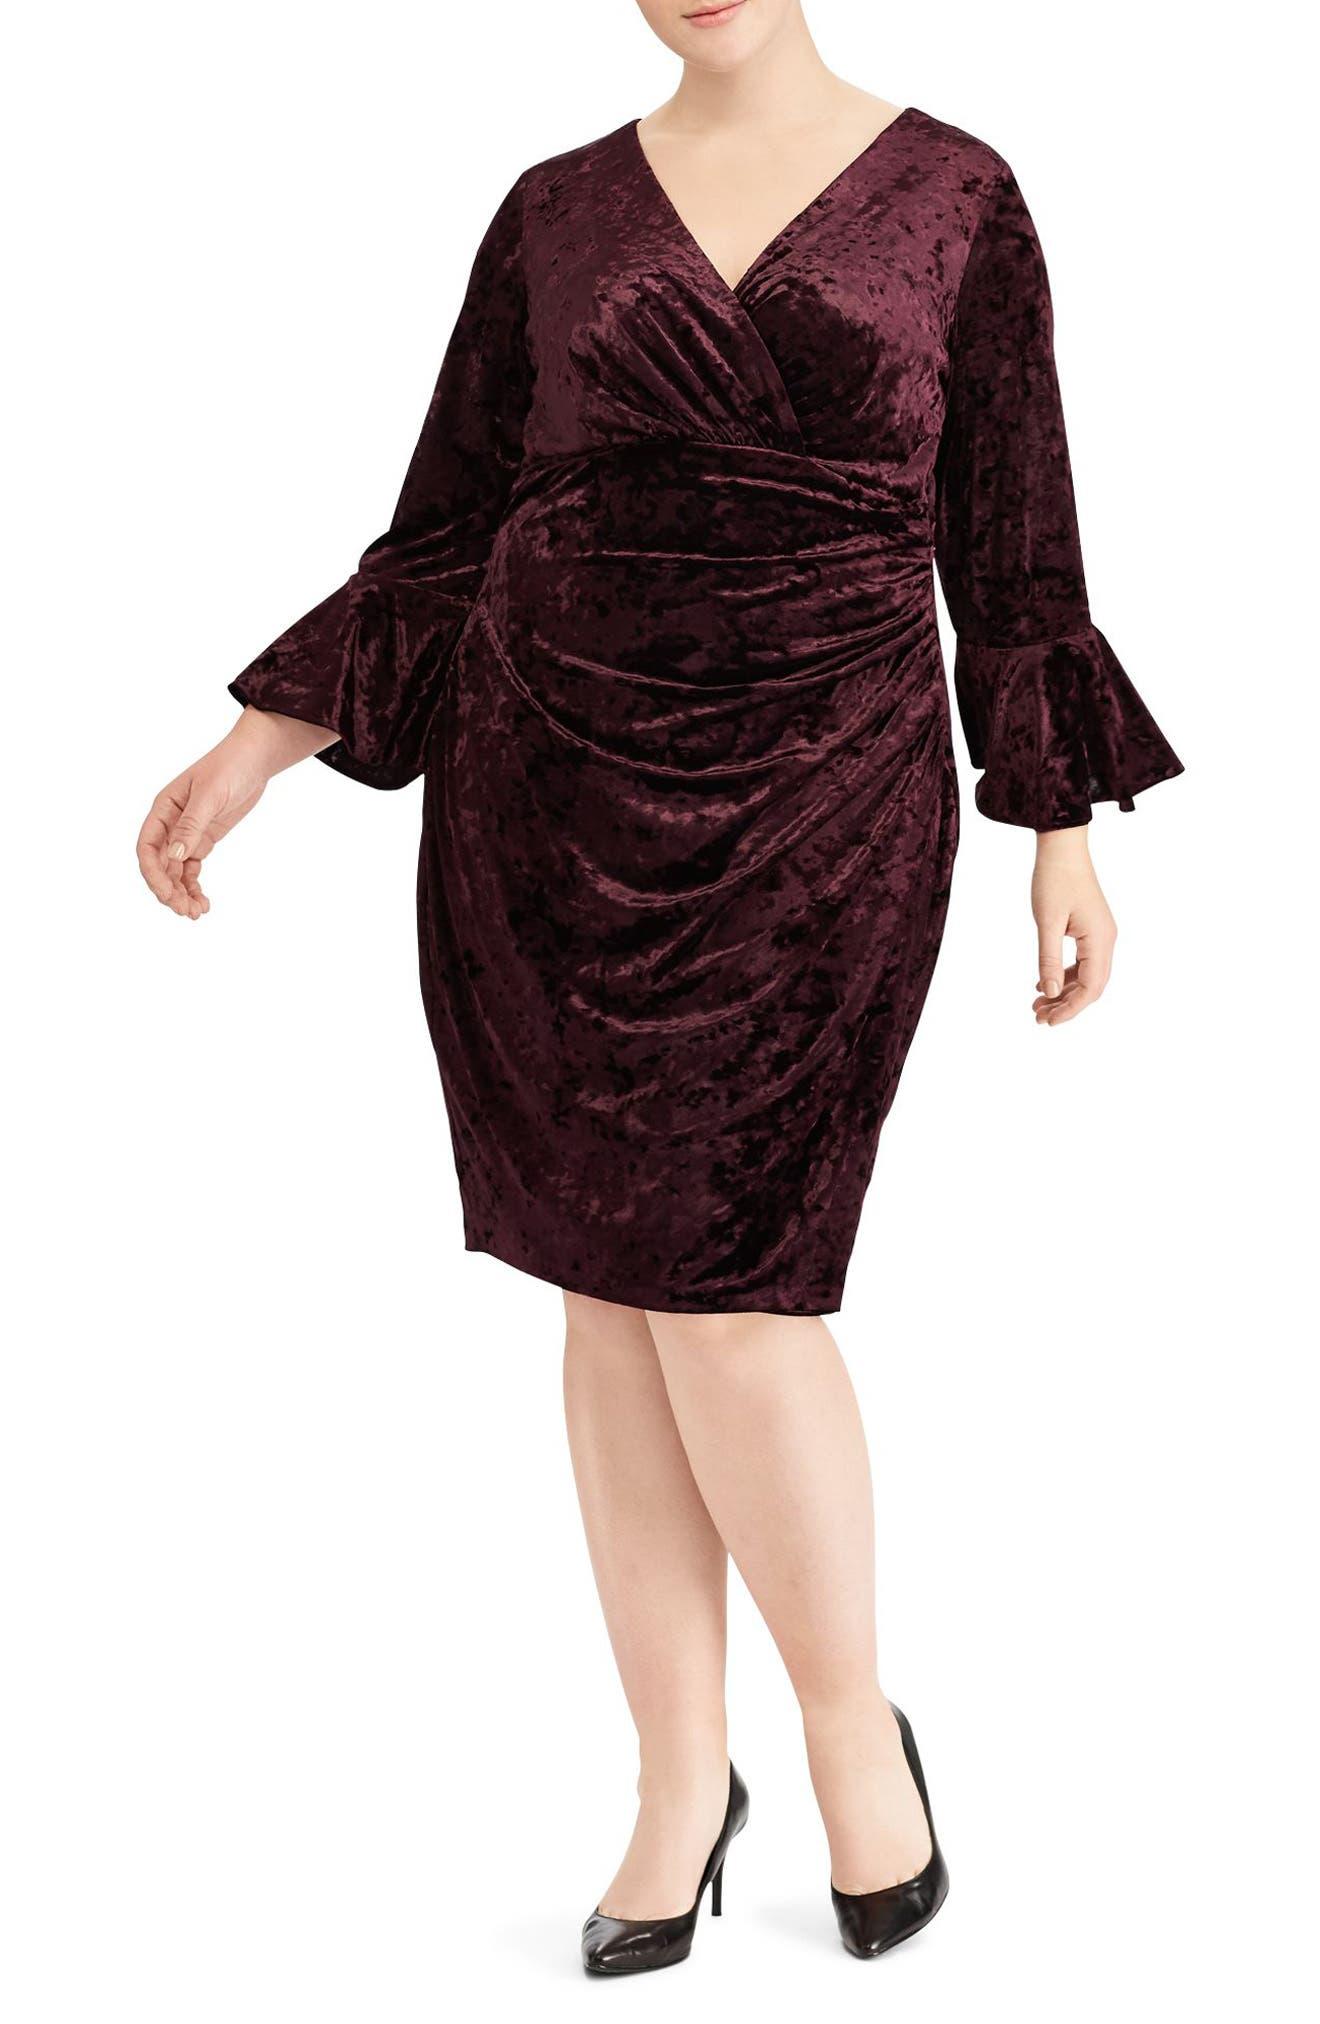 Ruched Crushed Velvet Sheath Dress,                         Main,                         color, Maroon